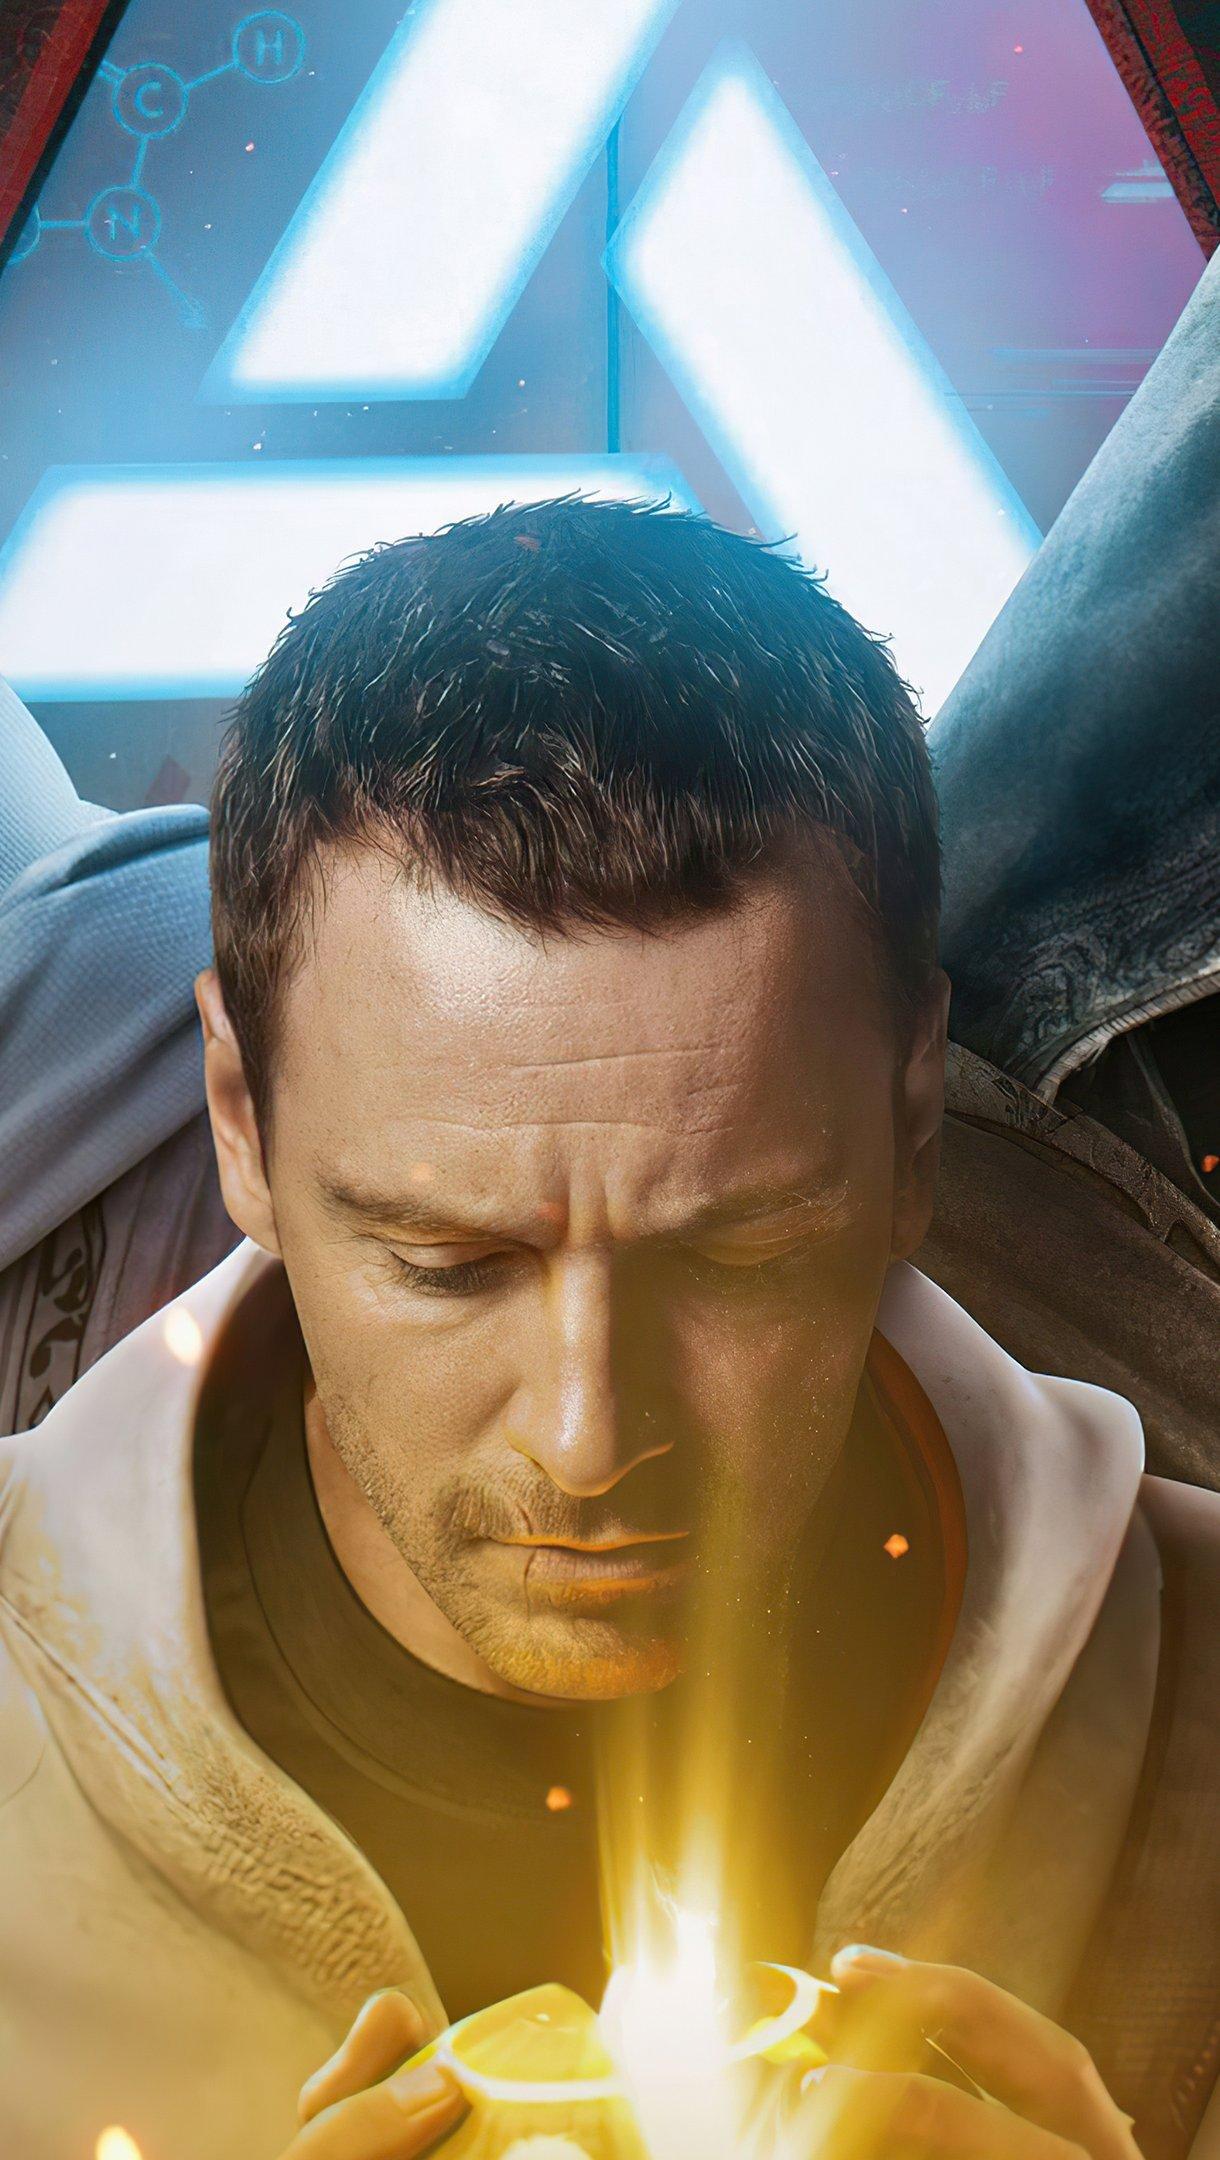 Fondos de pantalla Assassins Creed Serie de Netflix Vertical